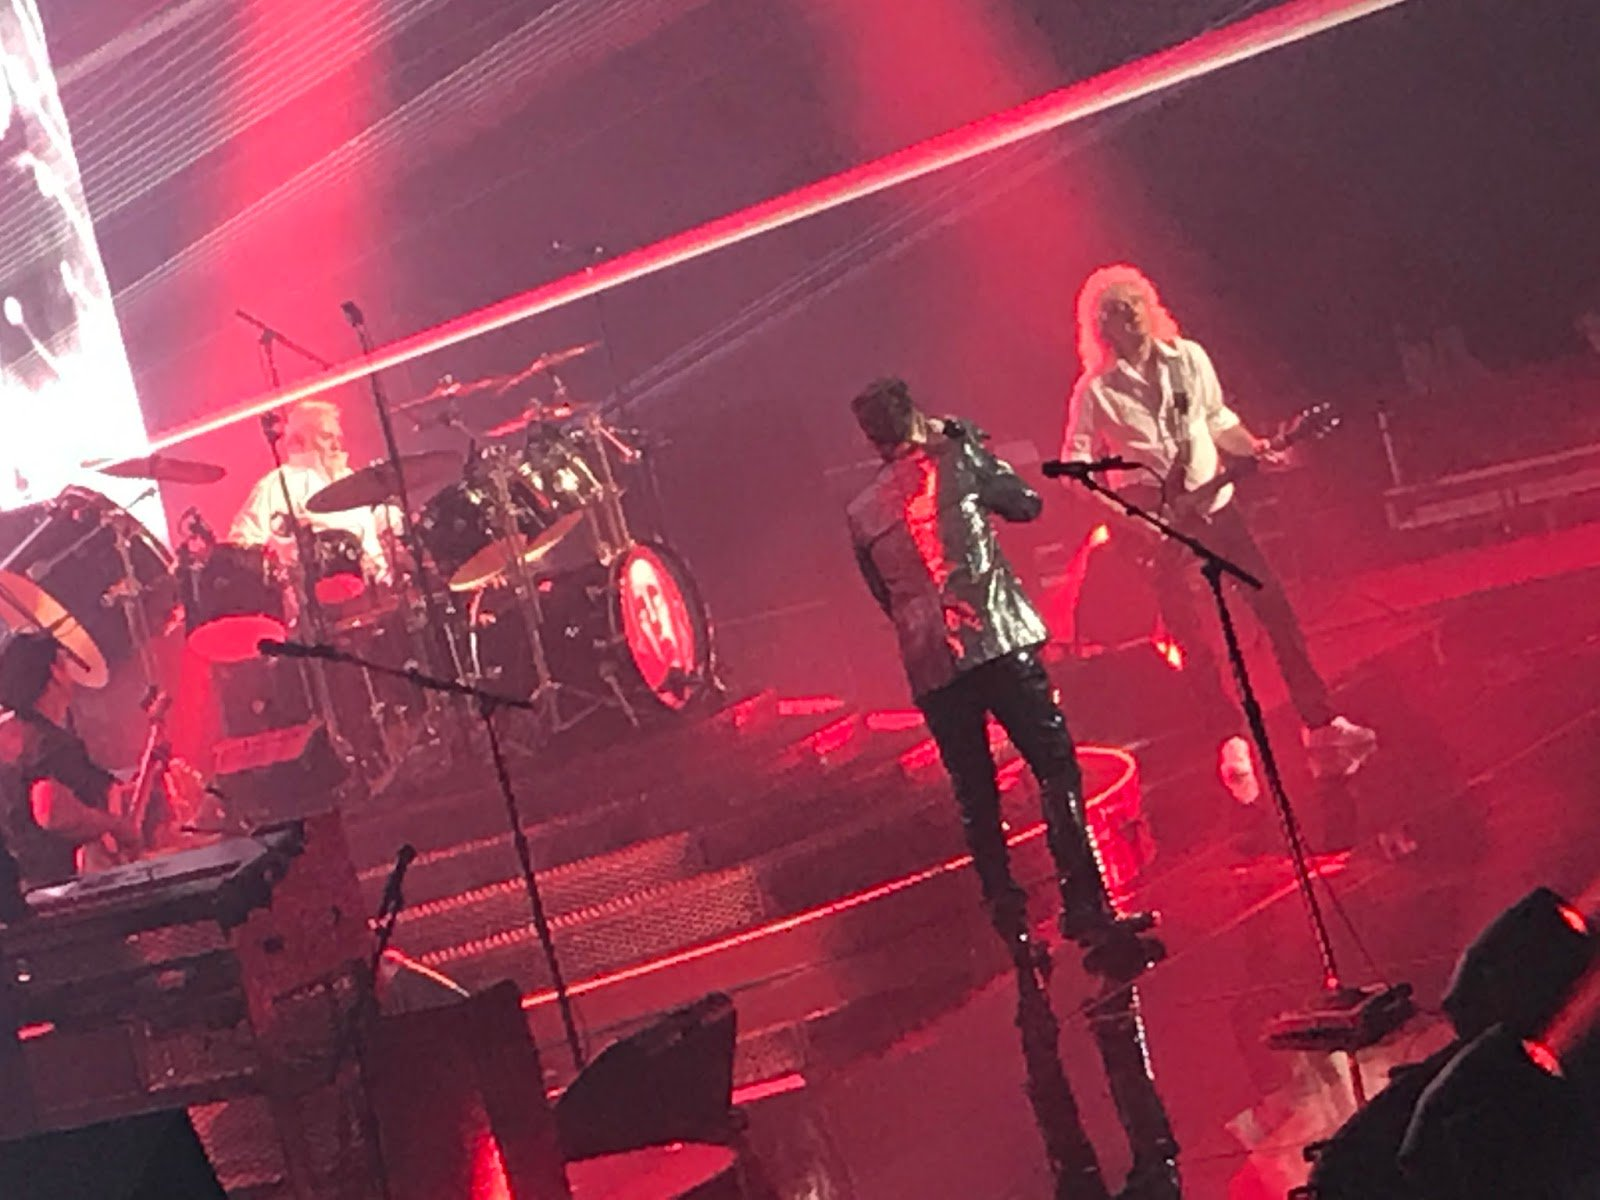 REVIEW MOHEGAN SUN: Queen Plus Adam Lambert Equals Success At Mohegan Sun https://t.co/citFWHPASm … https://t.co/FNbjOt4sv6